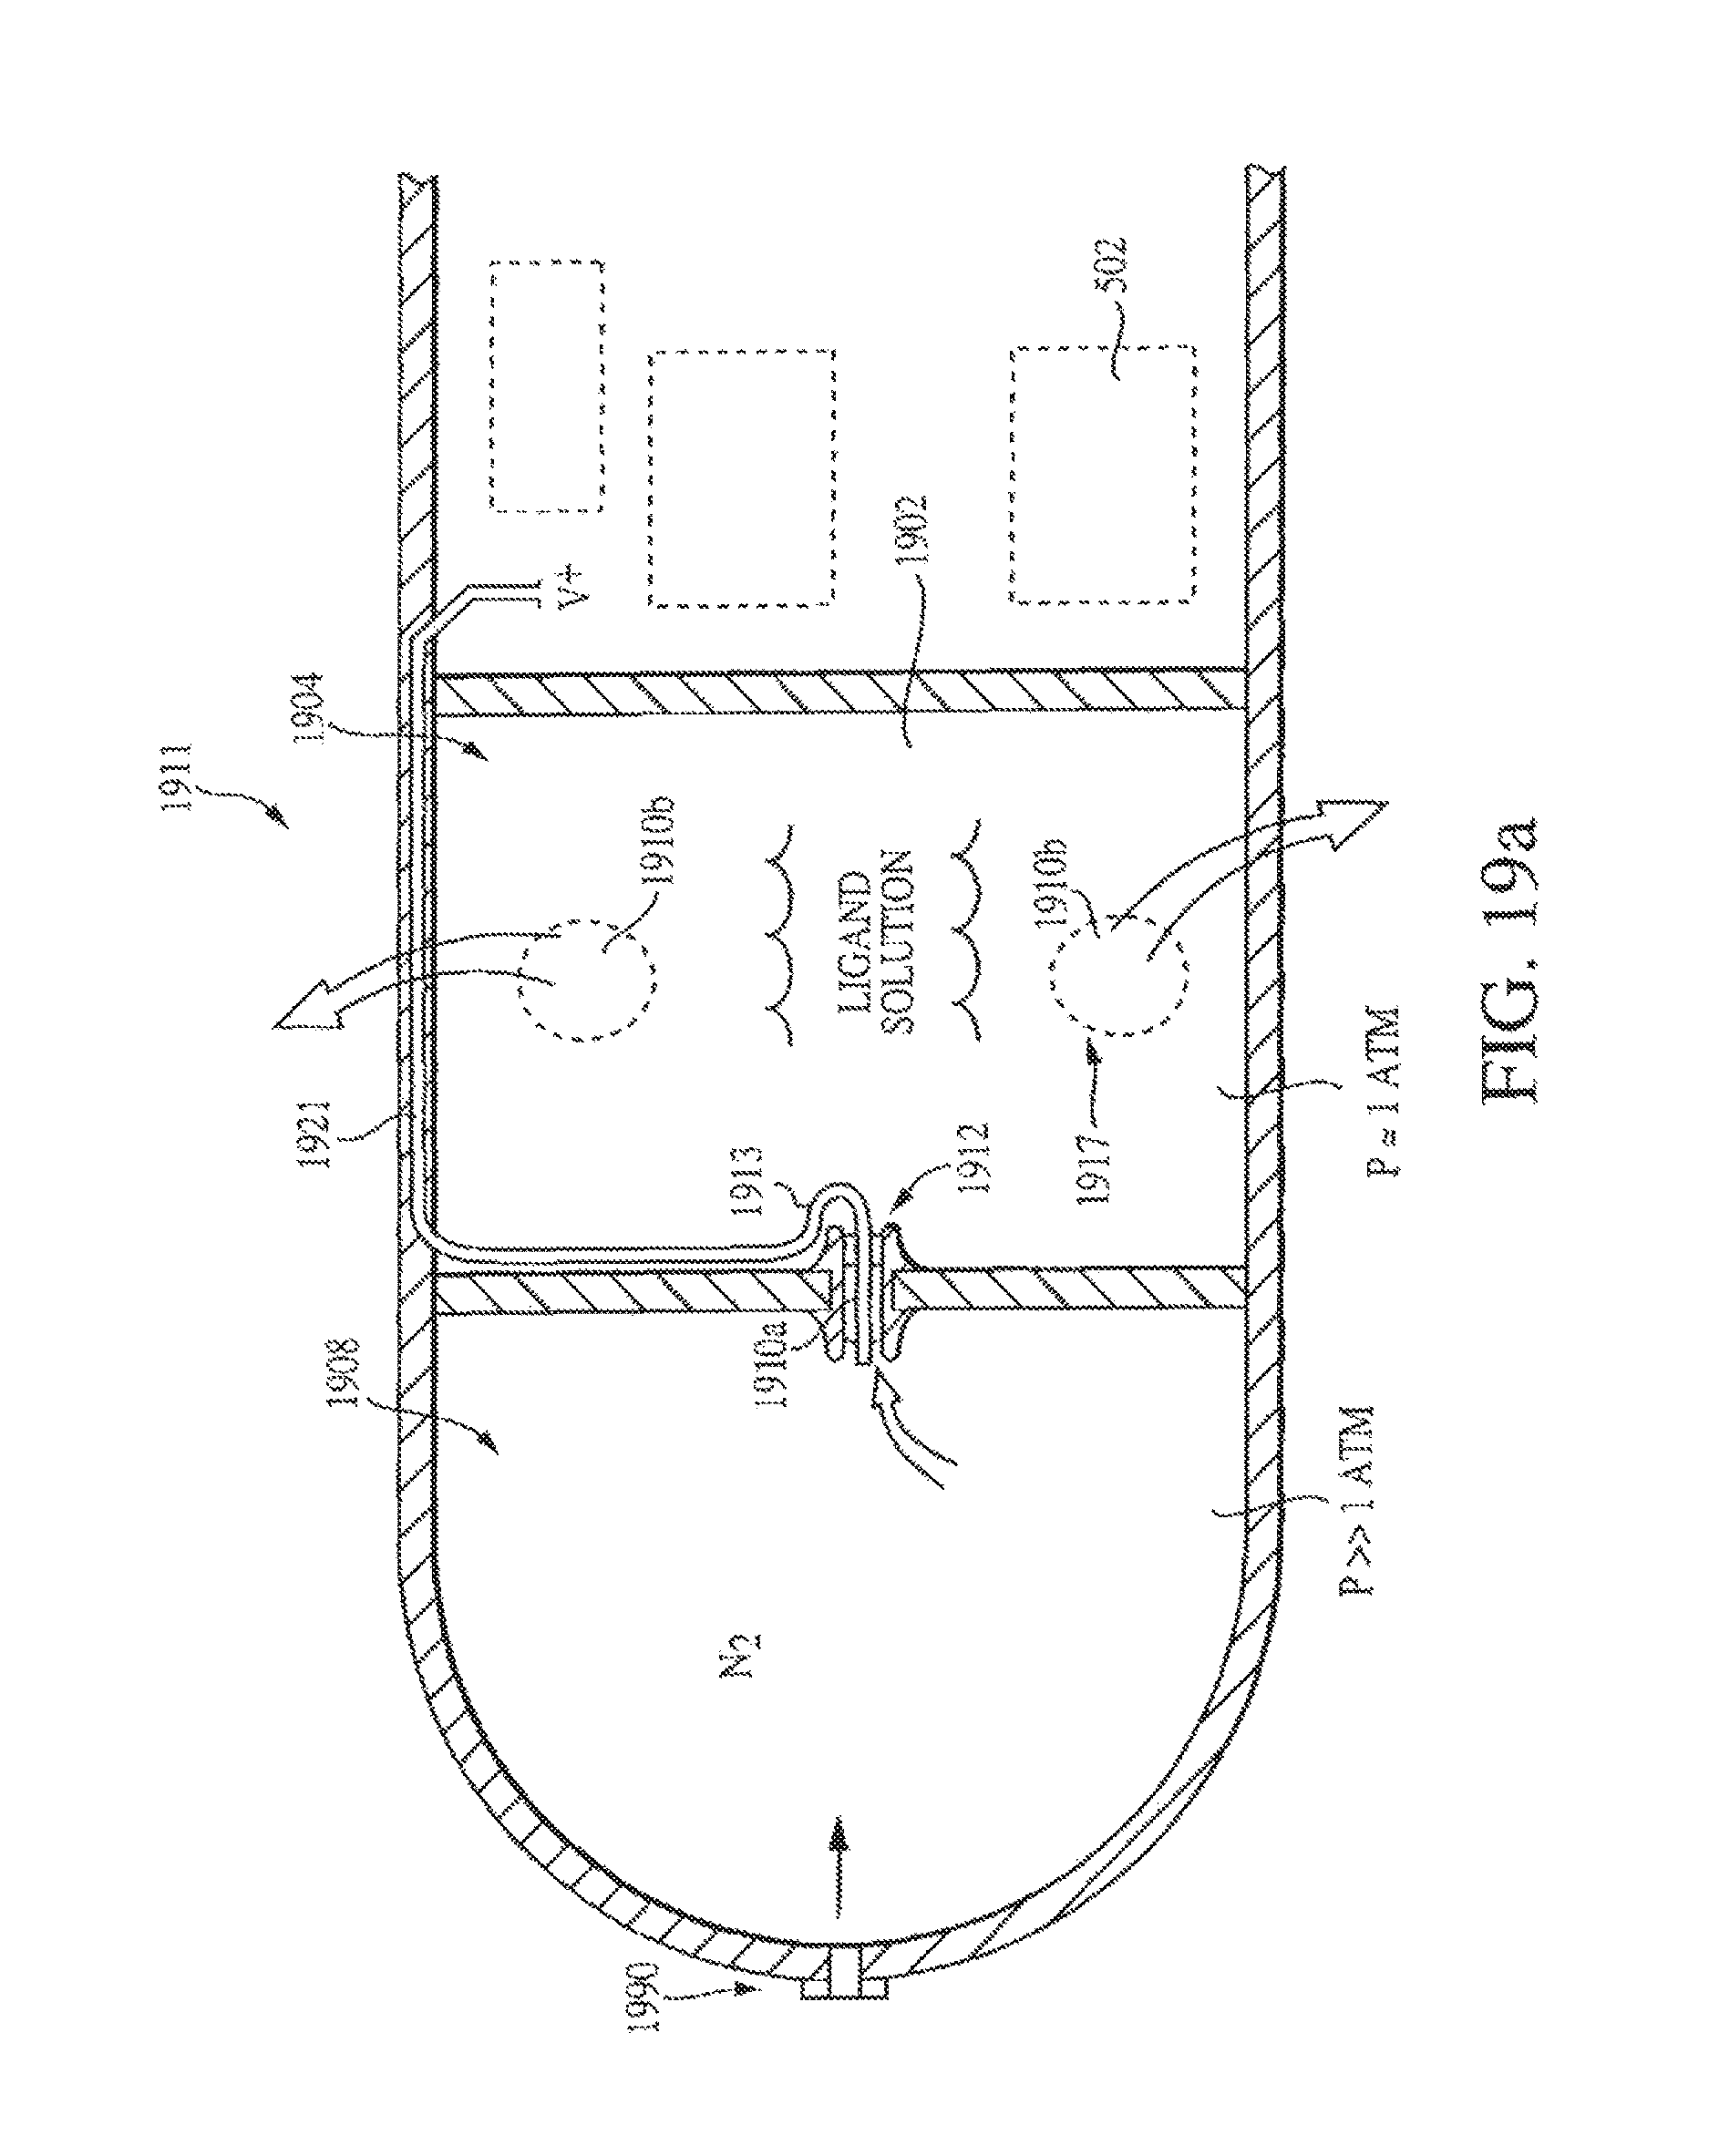 Patent Us 9913575 B2 Igniter Circuit Diagram In Addition Fm Transmitter Images